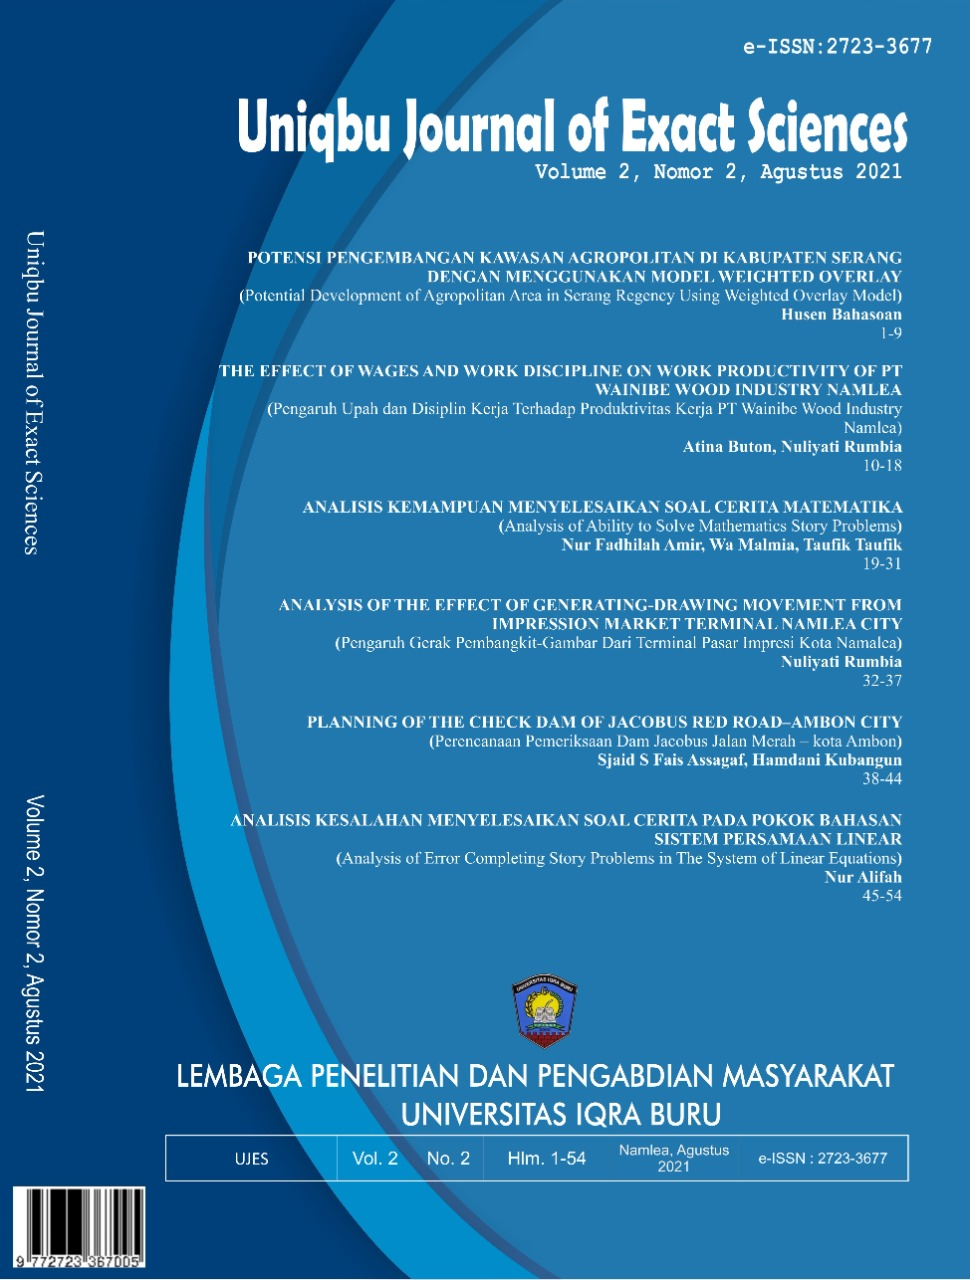 View Vol. 2 No. 2 (2021): Uniqbu Journal of Exact Sciences